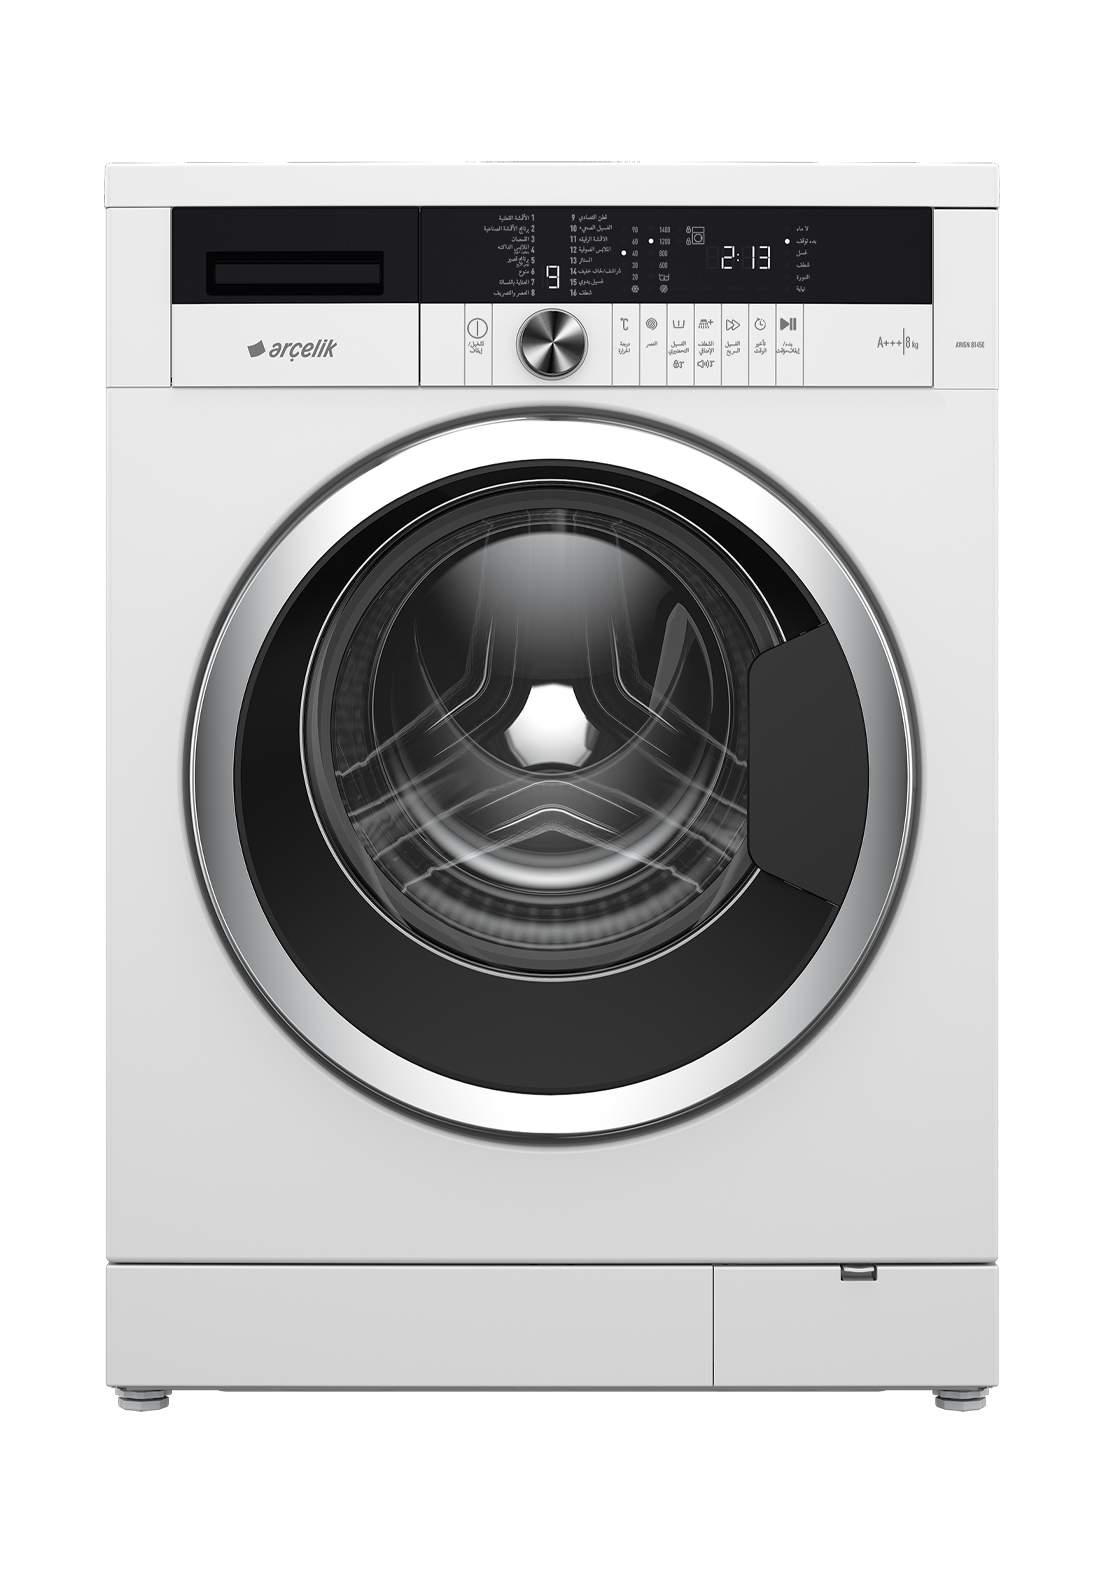 Arcelik AWN 41243 Washing machine 12 kg white غسالة 12 كيلو